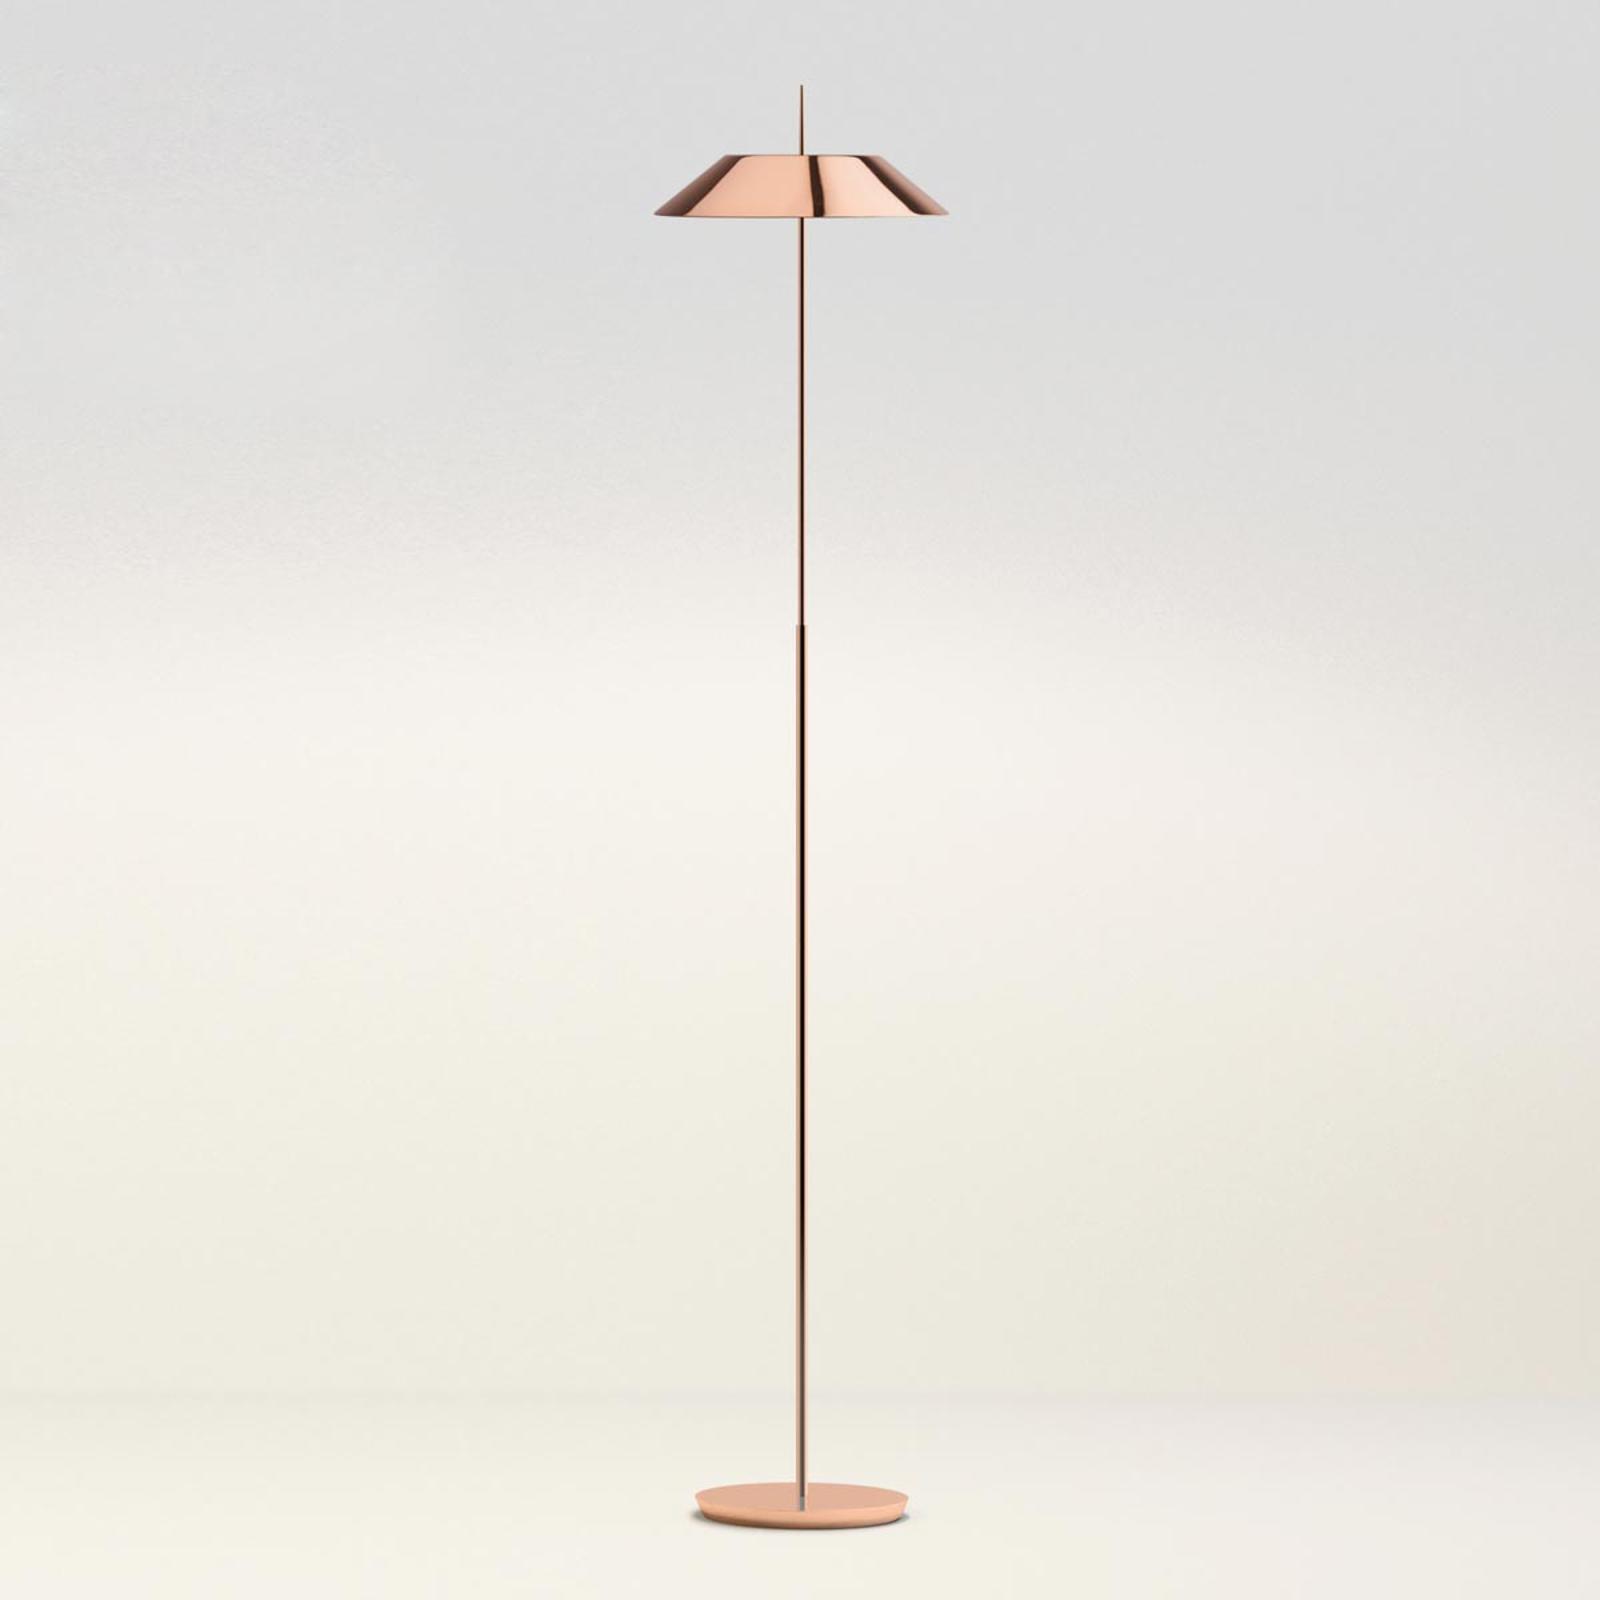 Szlachetna lampa stojąca LED Mayfair, jak z miedzi